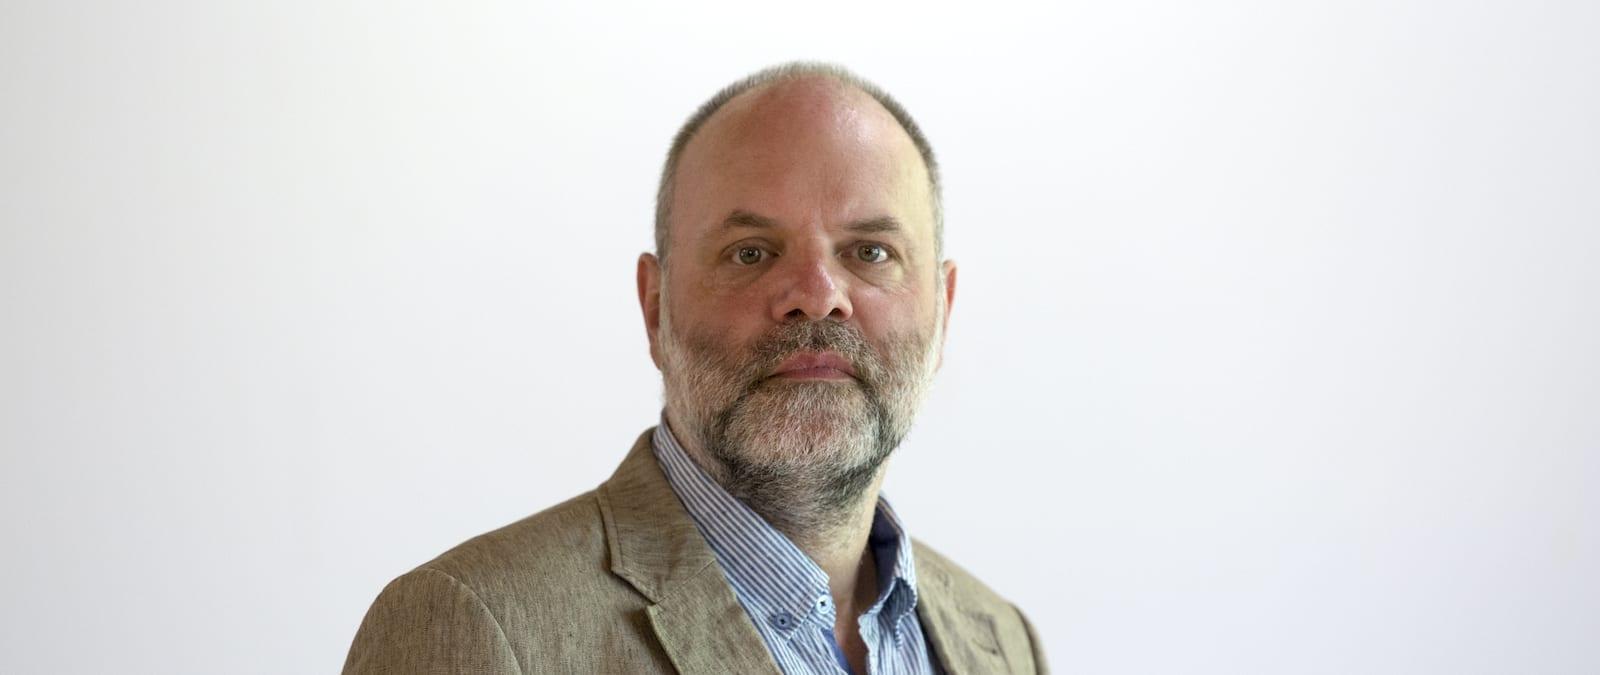 Thomas Geßner, serious